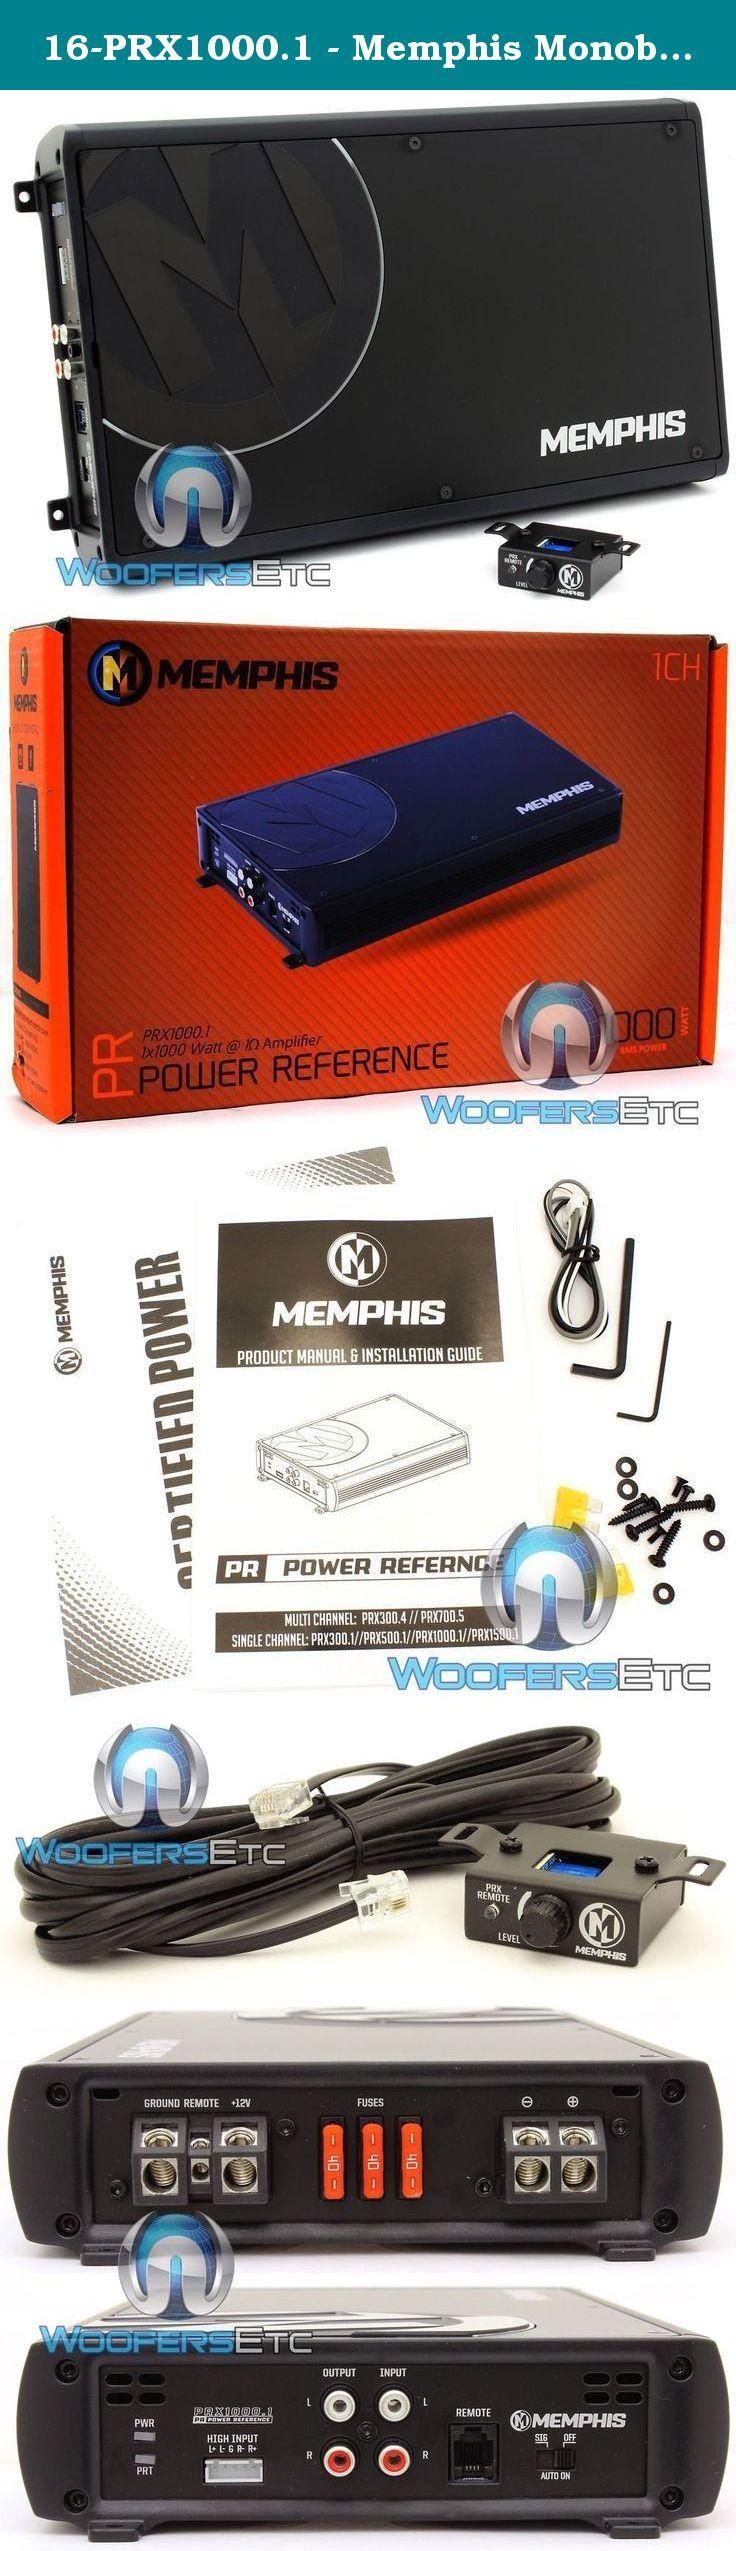 MEMPHIS PRX1000.1 AMP MONOBLOCK 2000W MAX SUBWOOFERS SPEAKERS BASS AMPLIFIER NEW